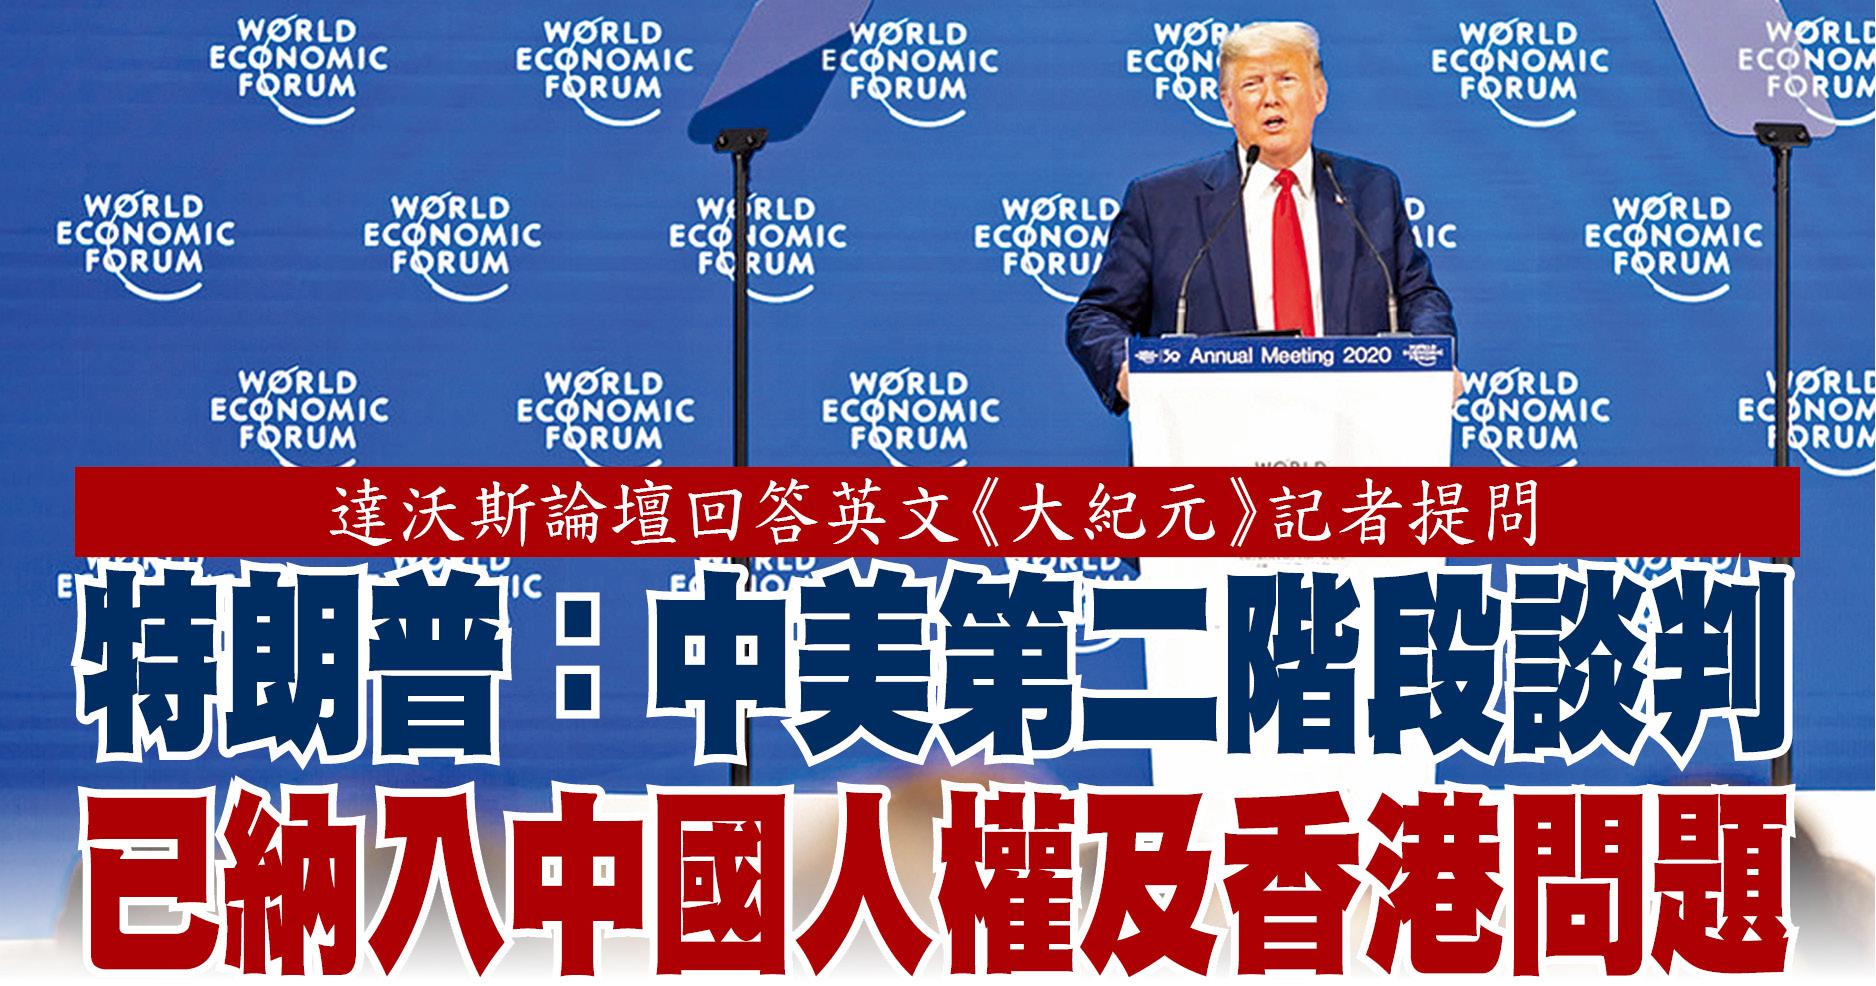 特朗普總統1月21日在WEF年會發表演說。(Getty Images)